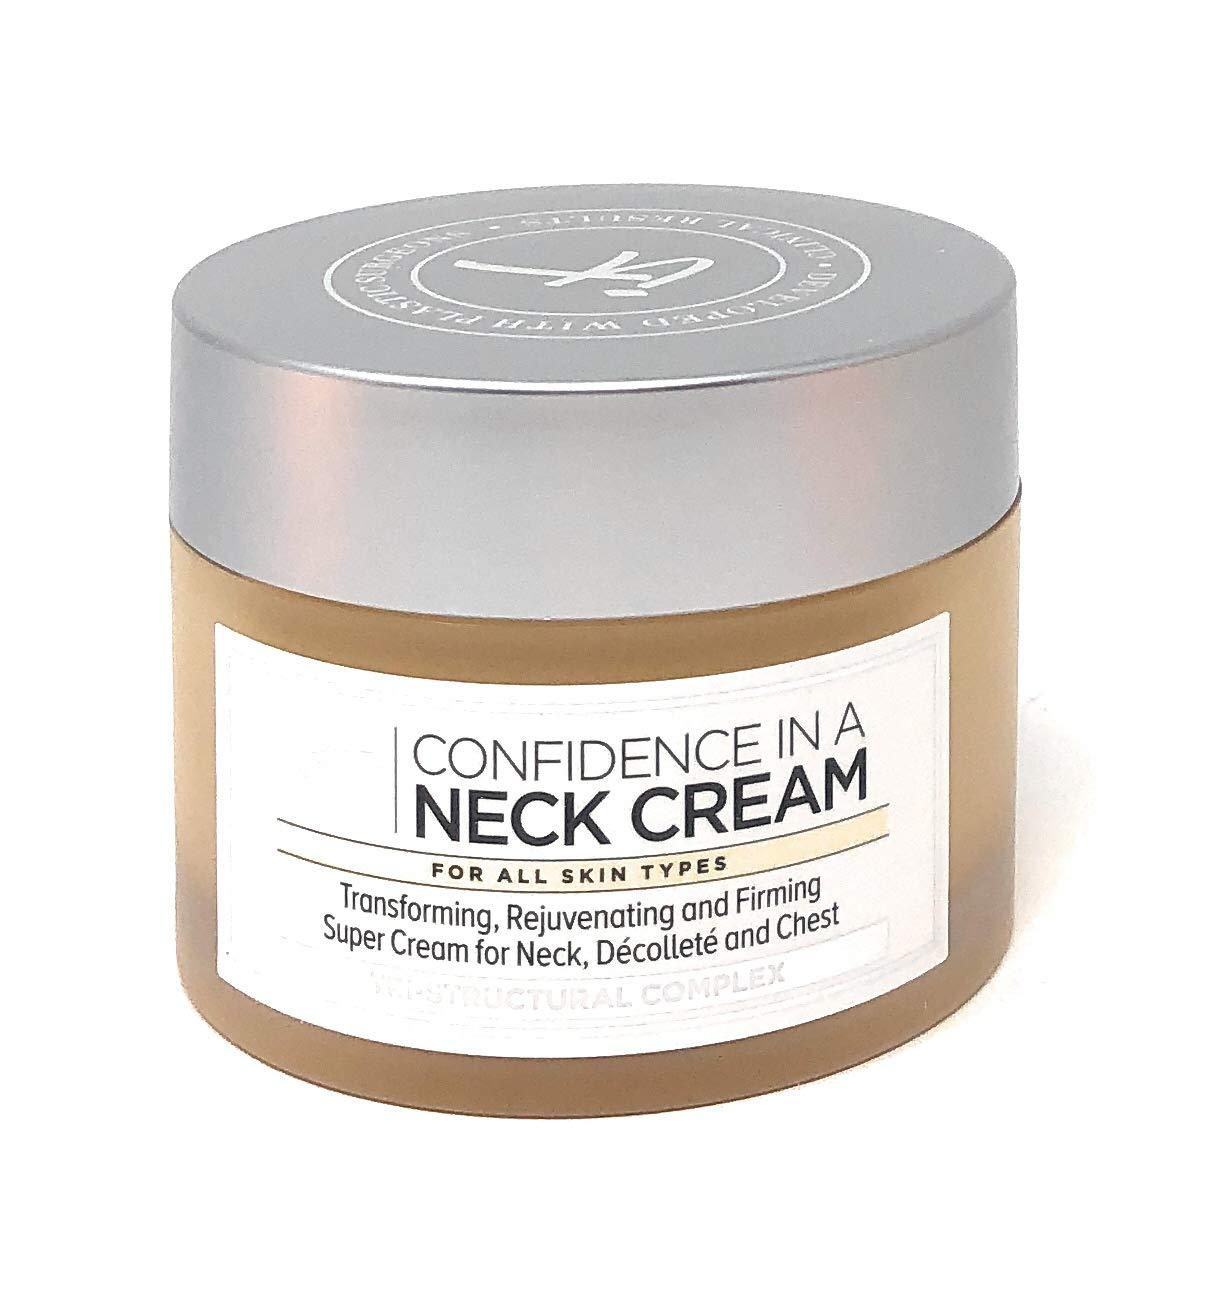 It Cosmetics Confidence in A Neck Cream 2.6 fl. oz. by It Cosmetics (Image #1)